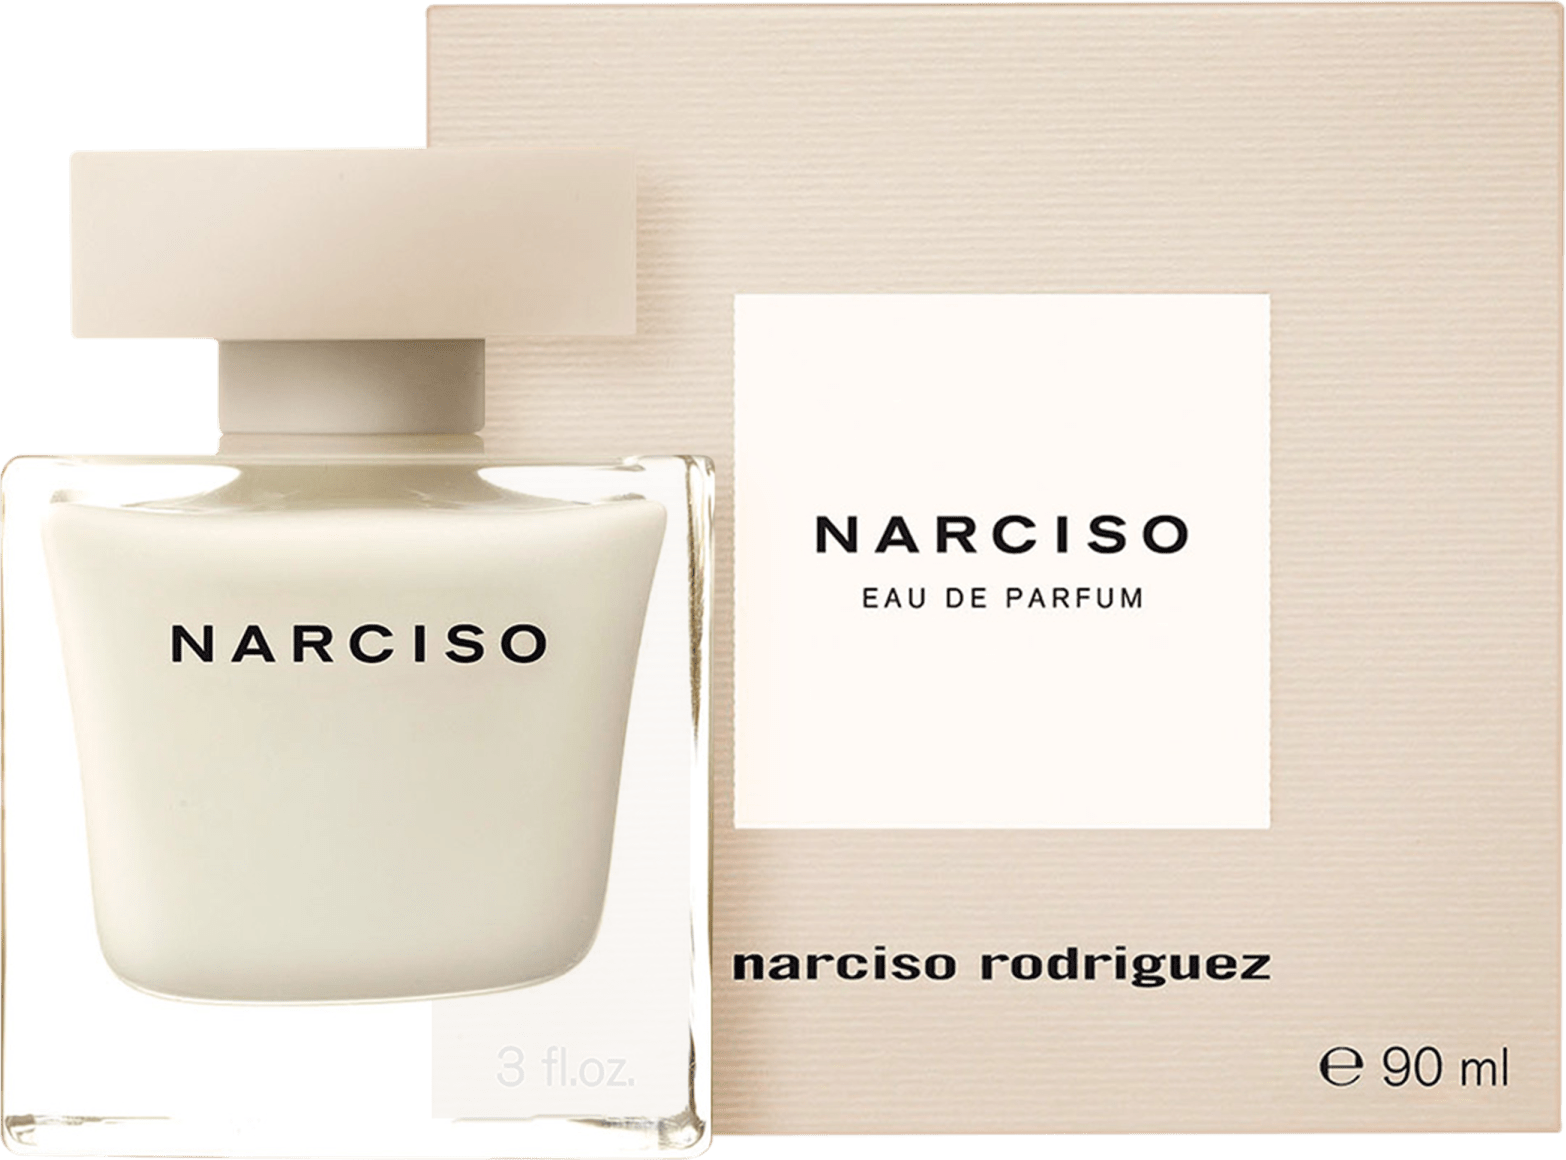 narciso narciso rodriguez edp perfume feminino beleza na web. Black Bedroom Furniture Sets. Home Design Ideas